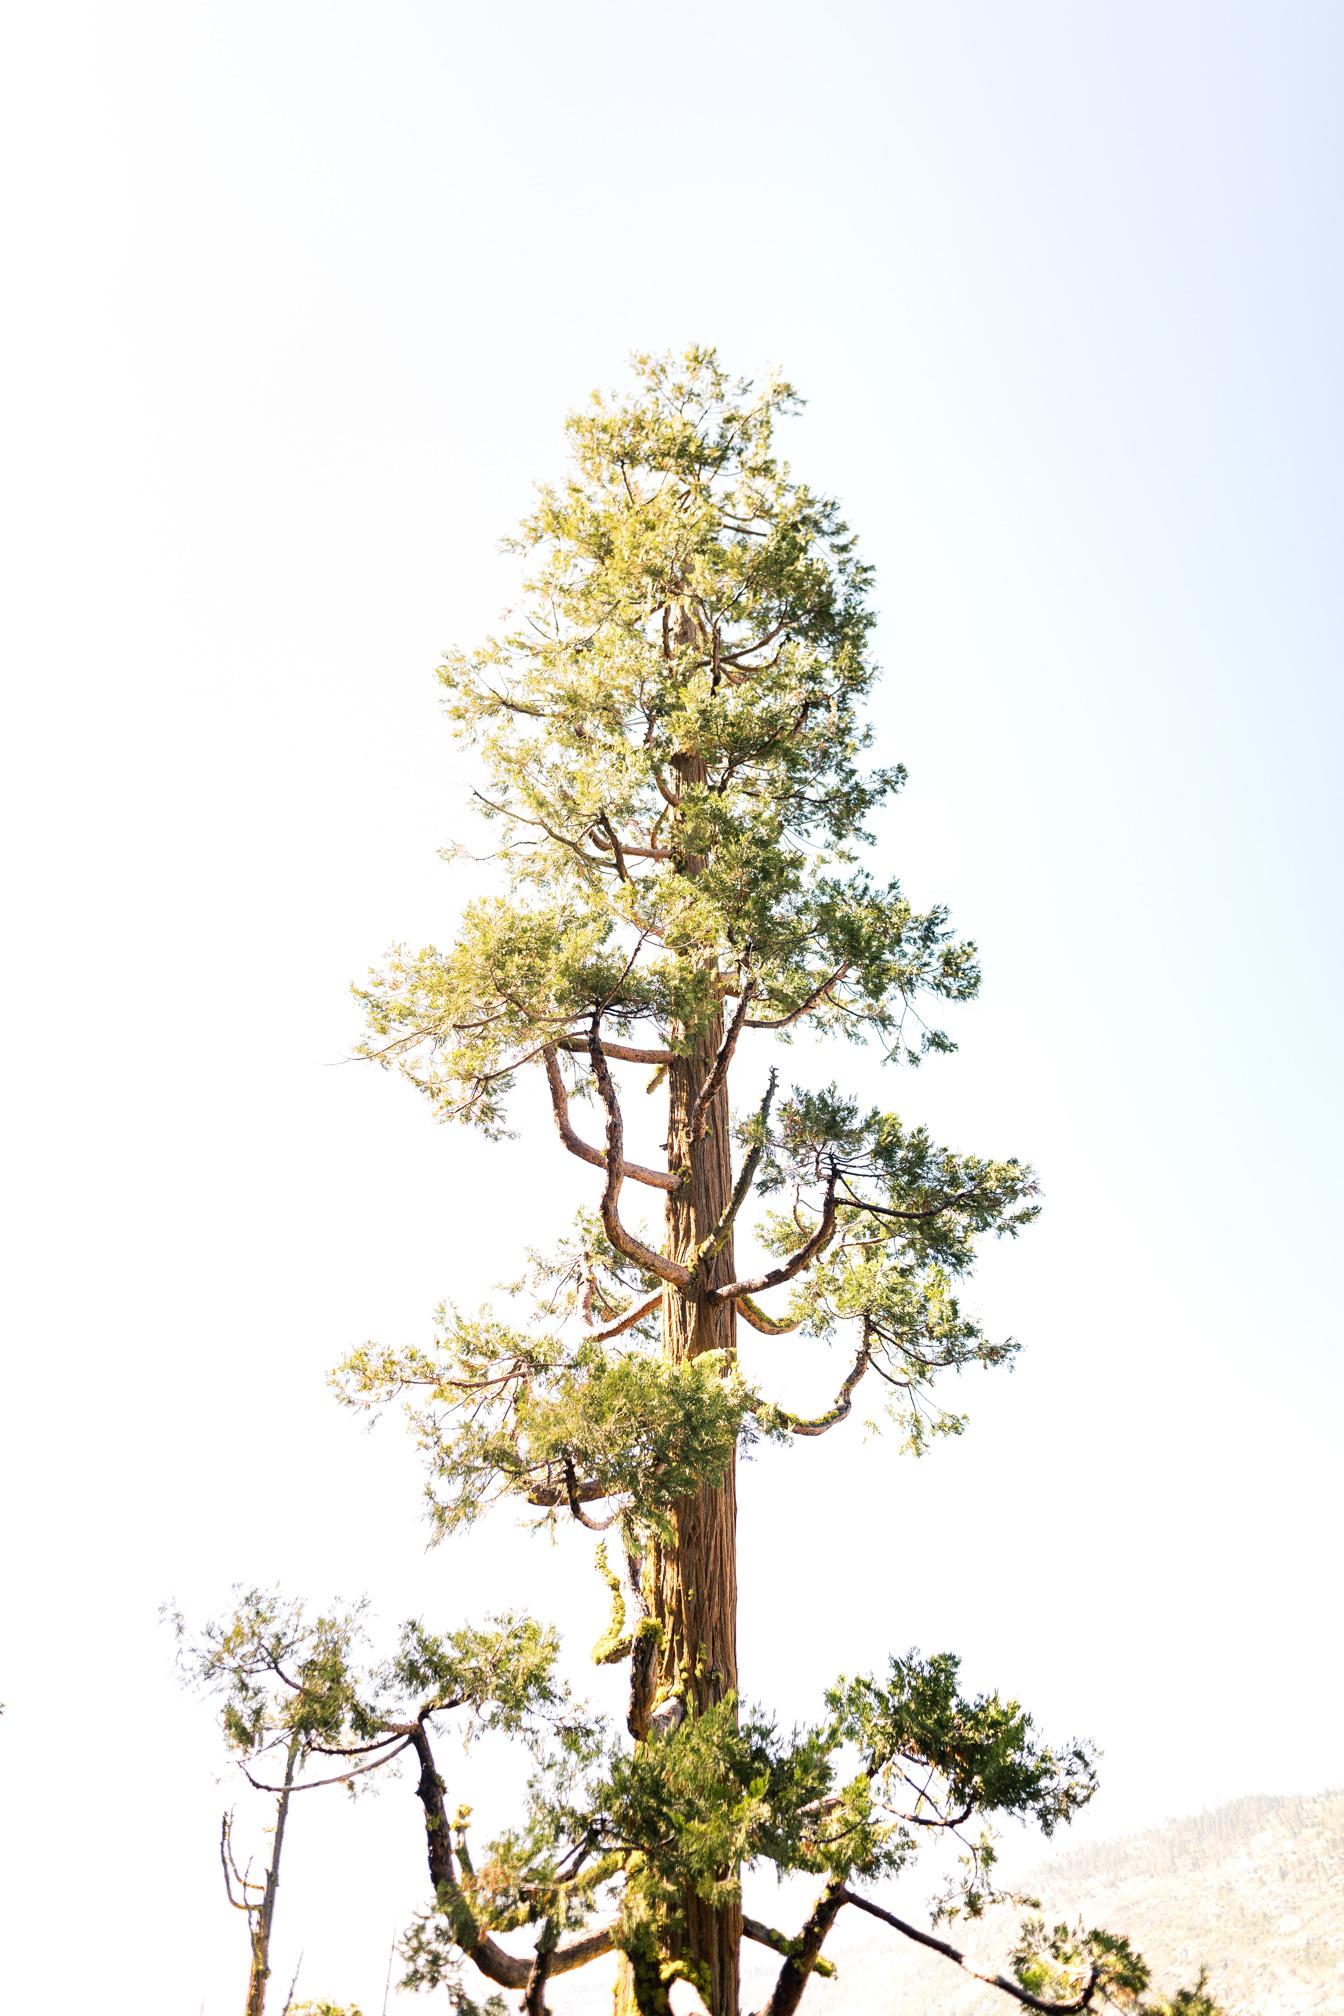 tuolumne-county-adventure-yosemite-99-18.jpg